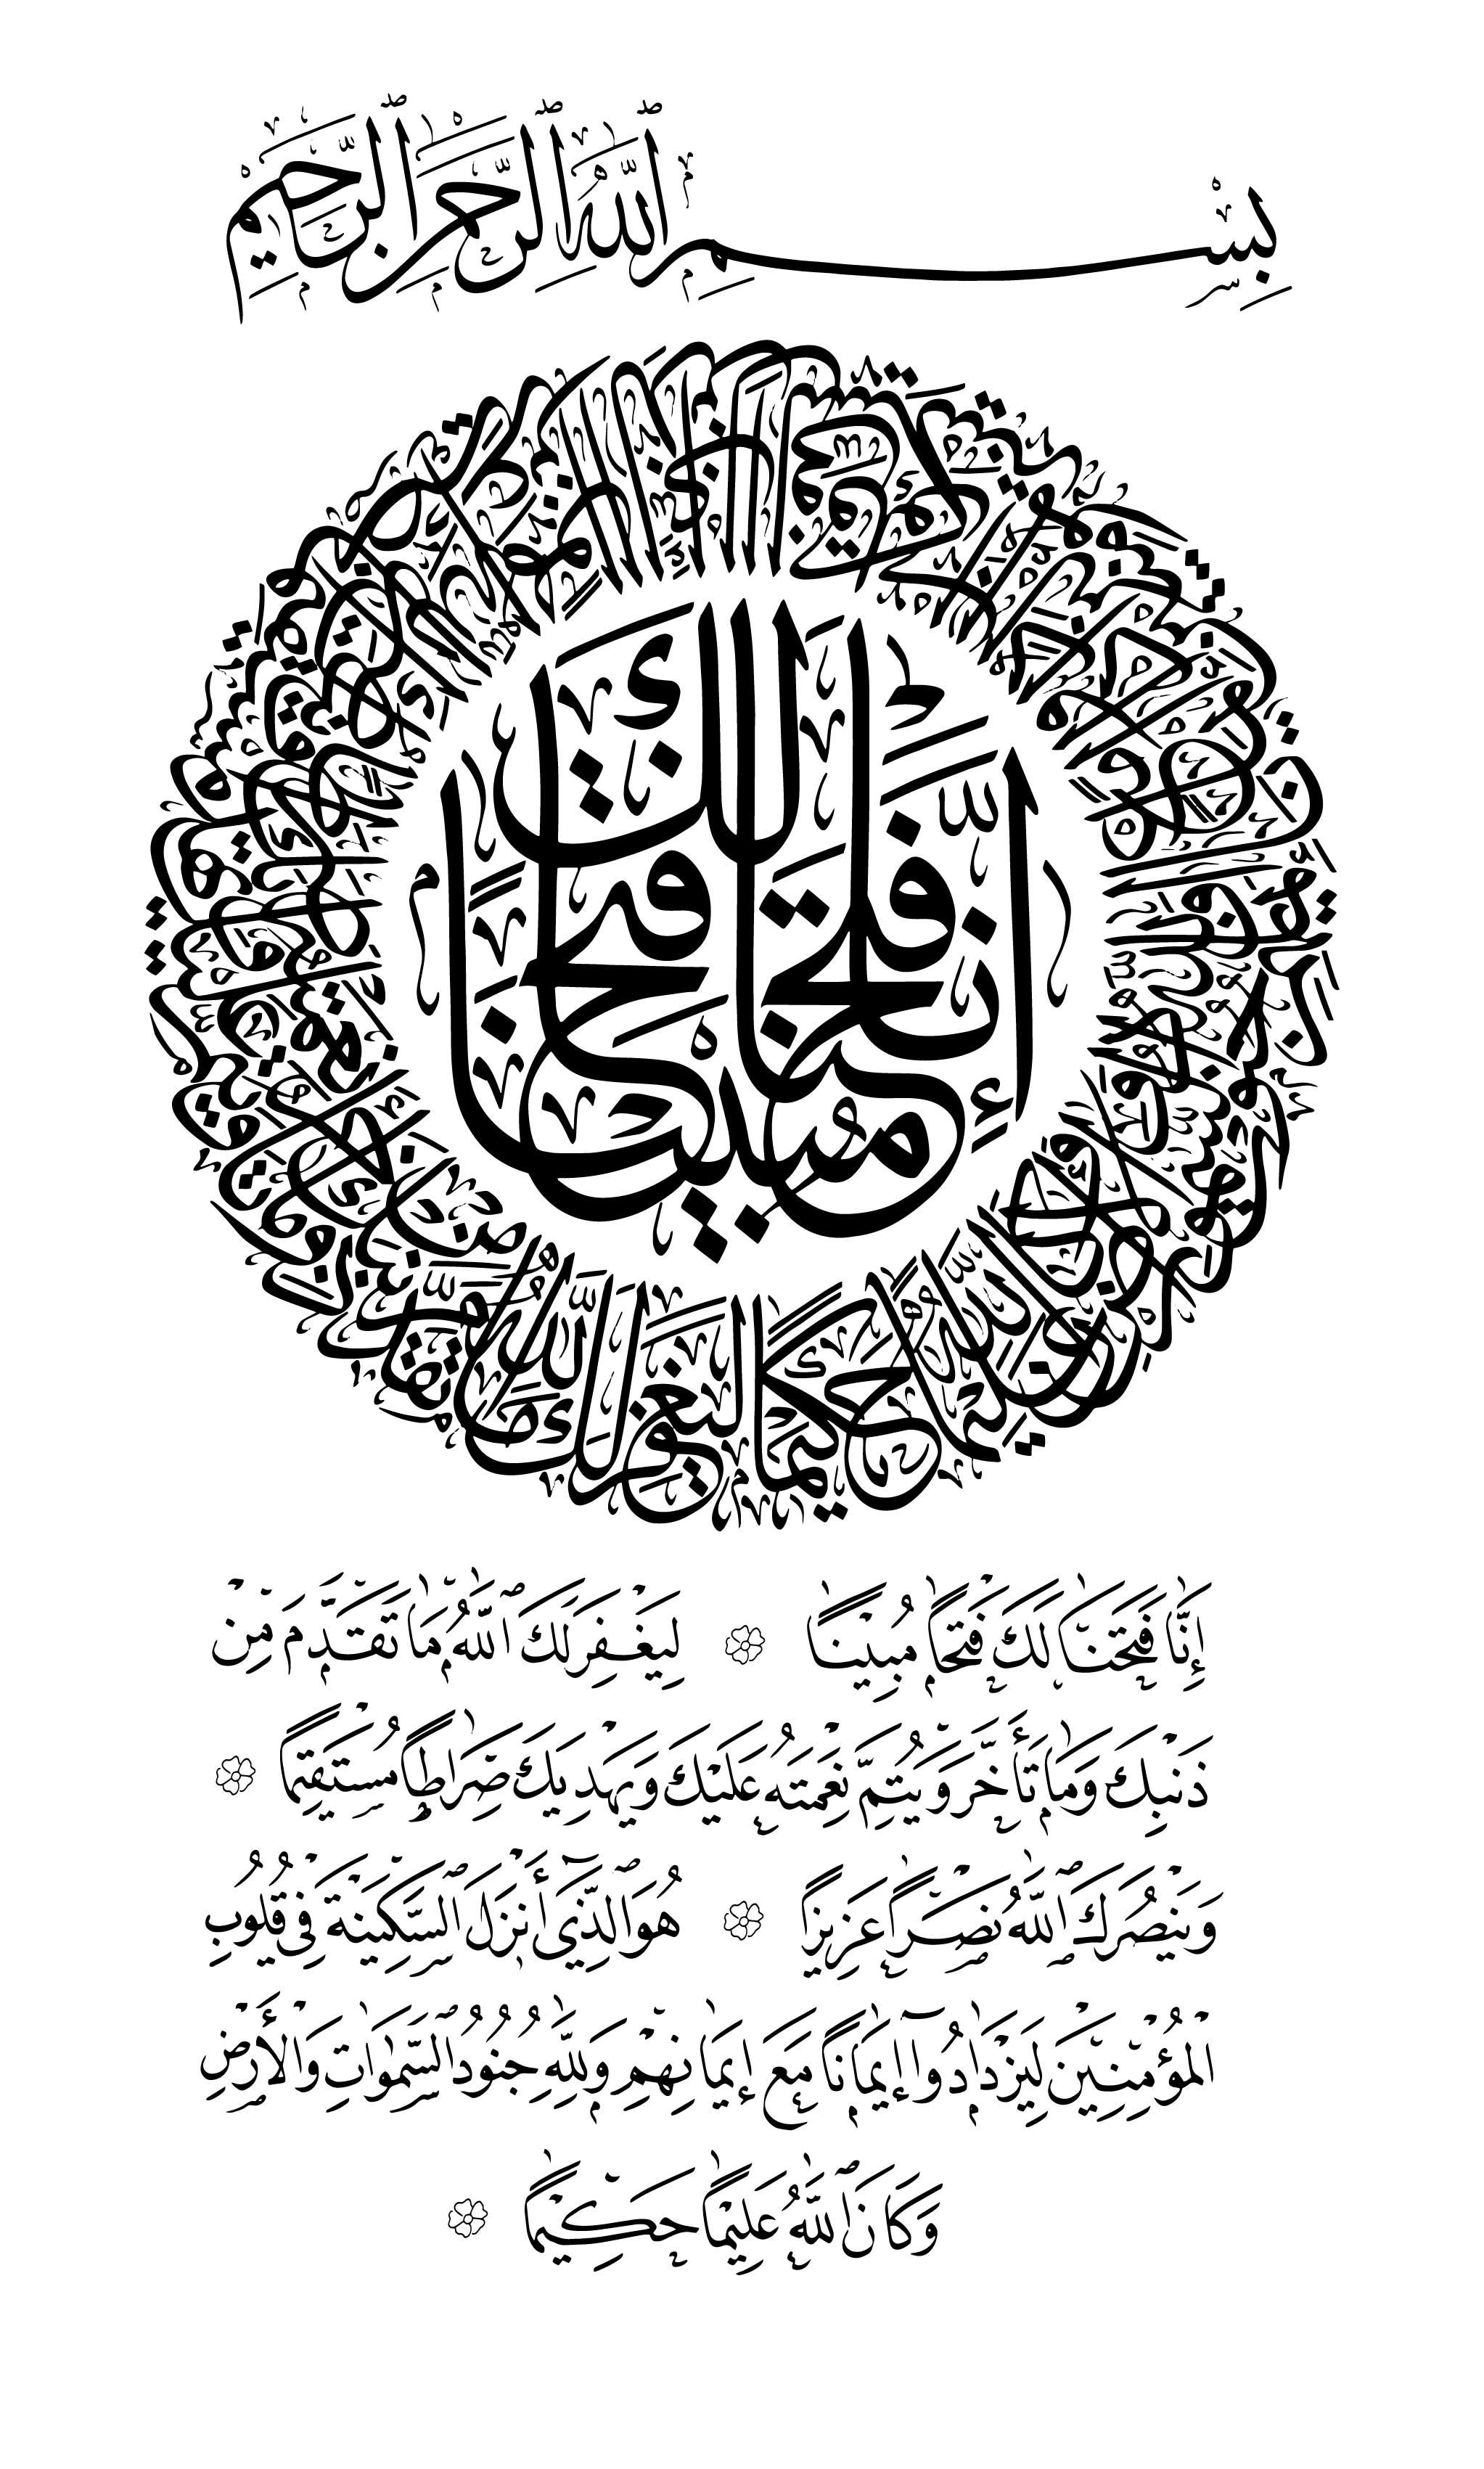 Free Islamic Calligraphy Al Fath 48 1 4